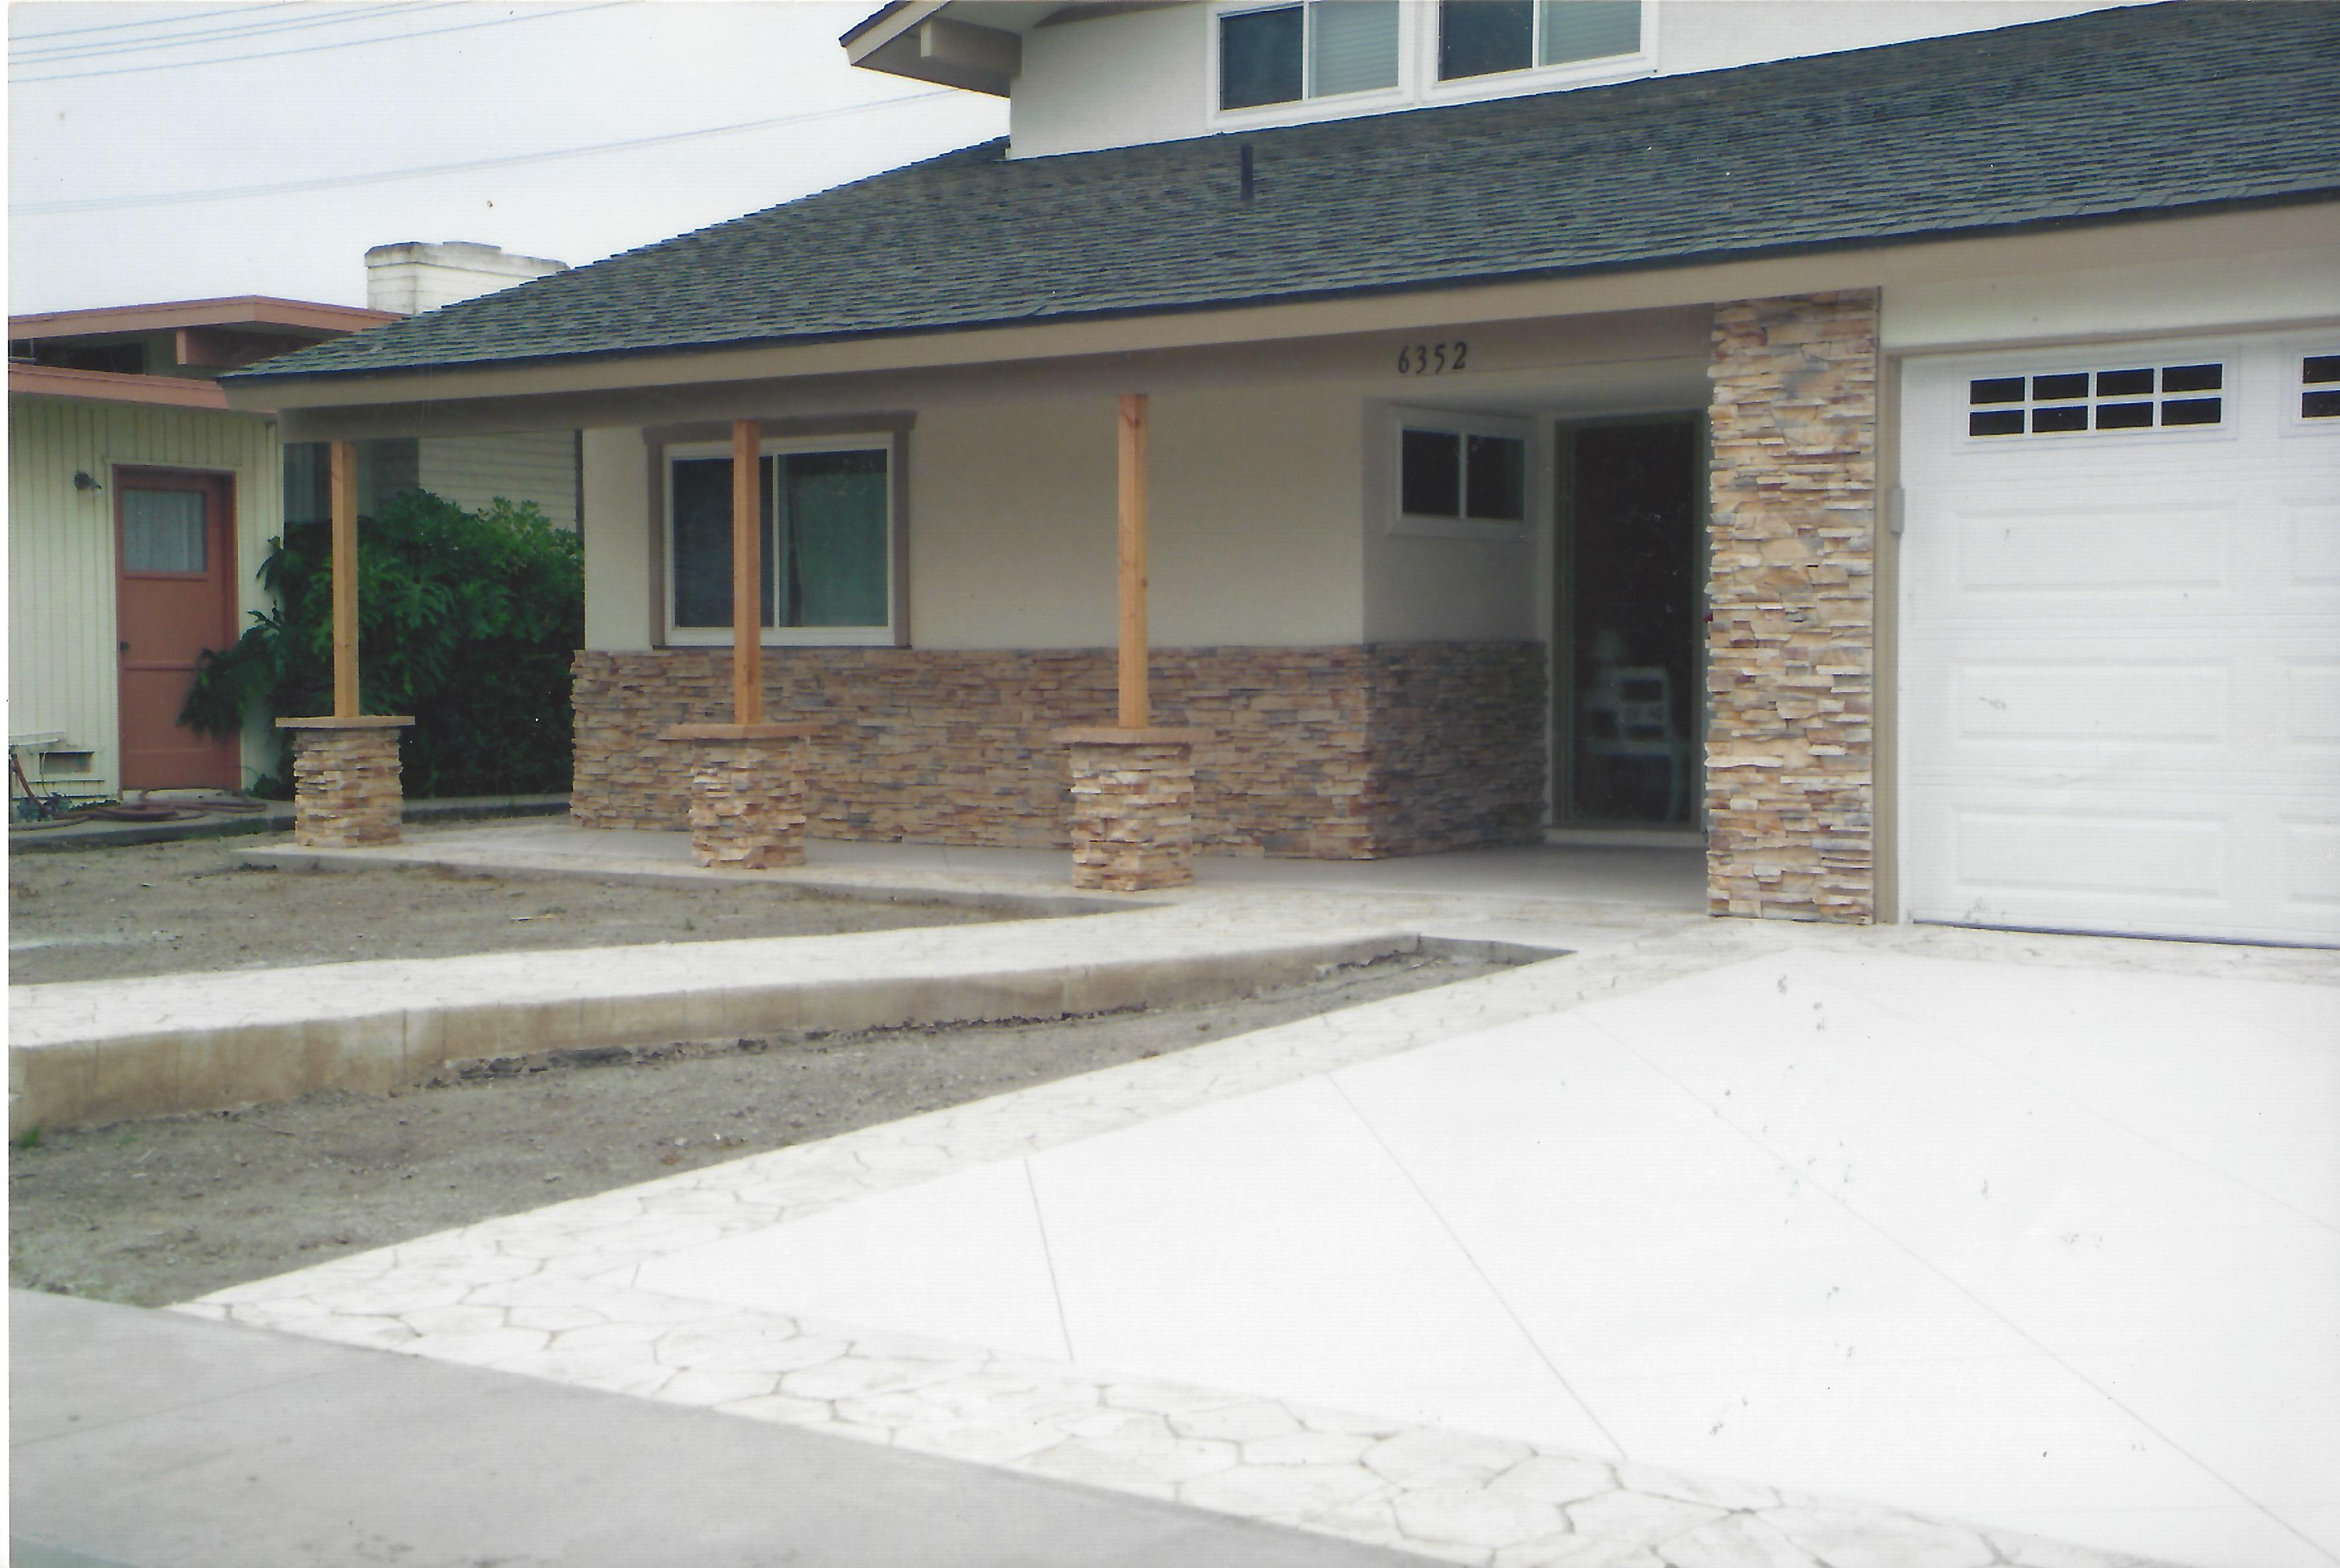 Homefront Uplift